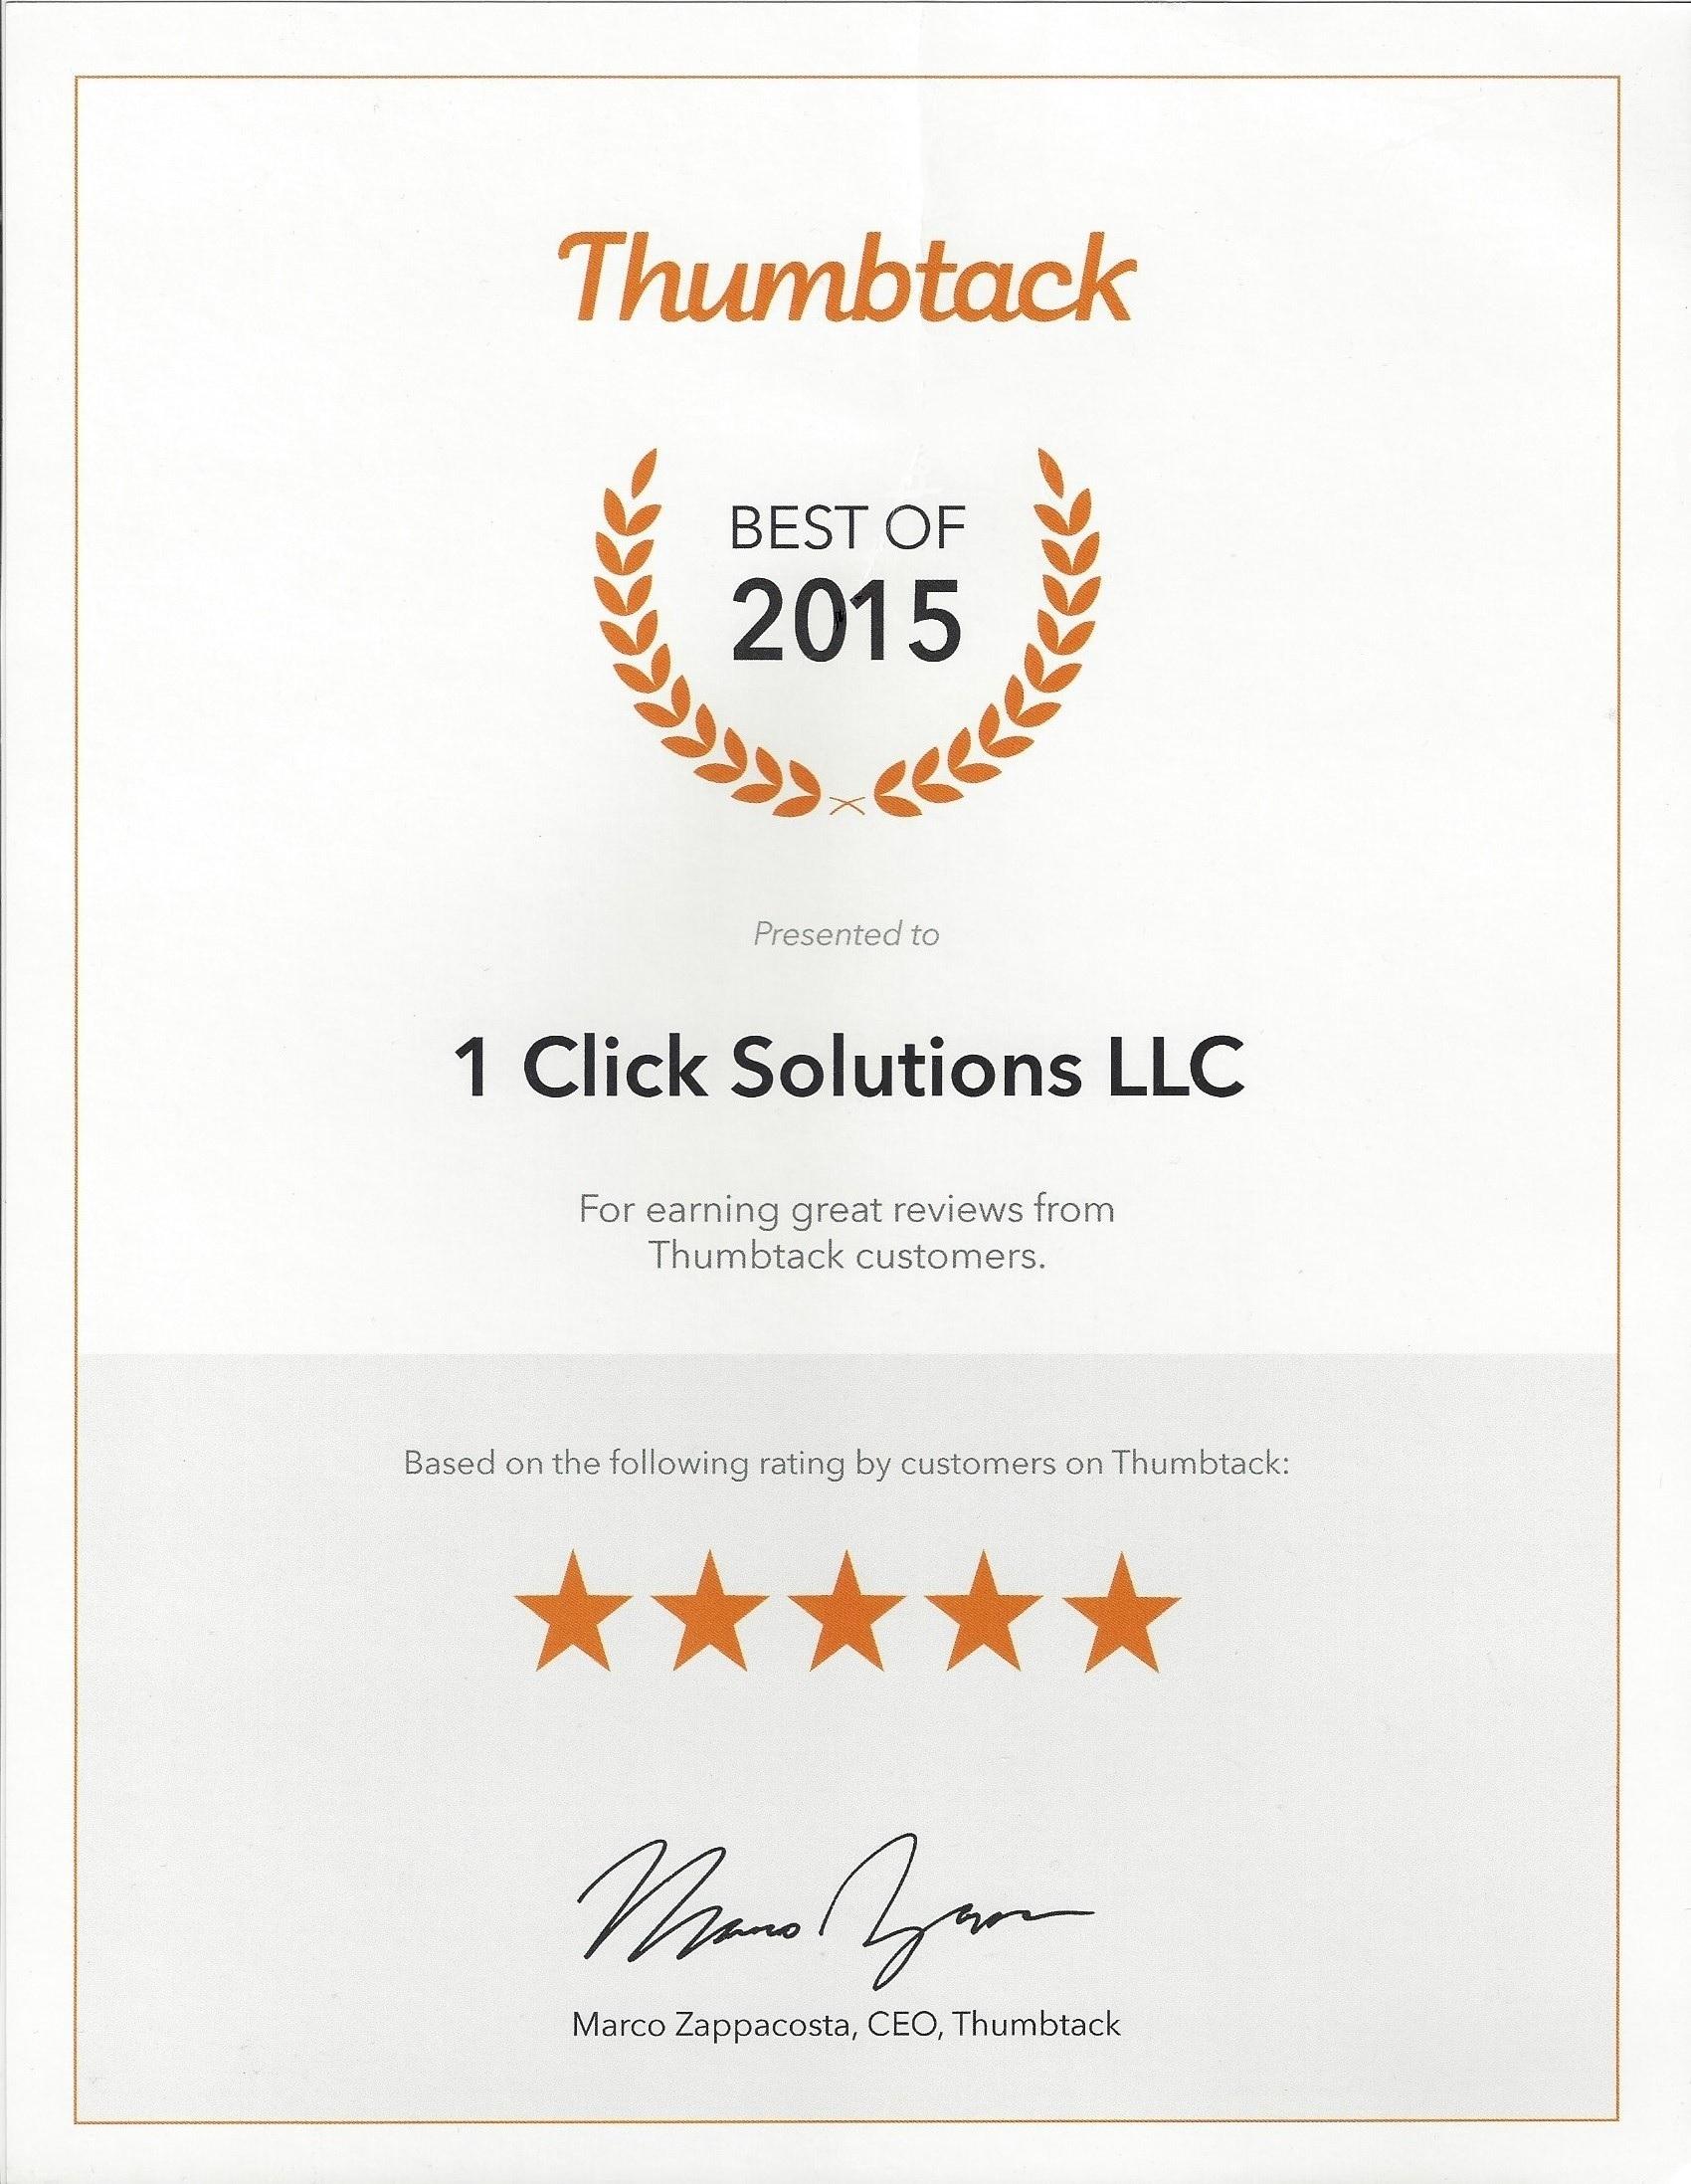 Thumbtack leads reviews